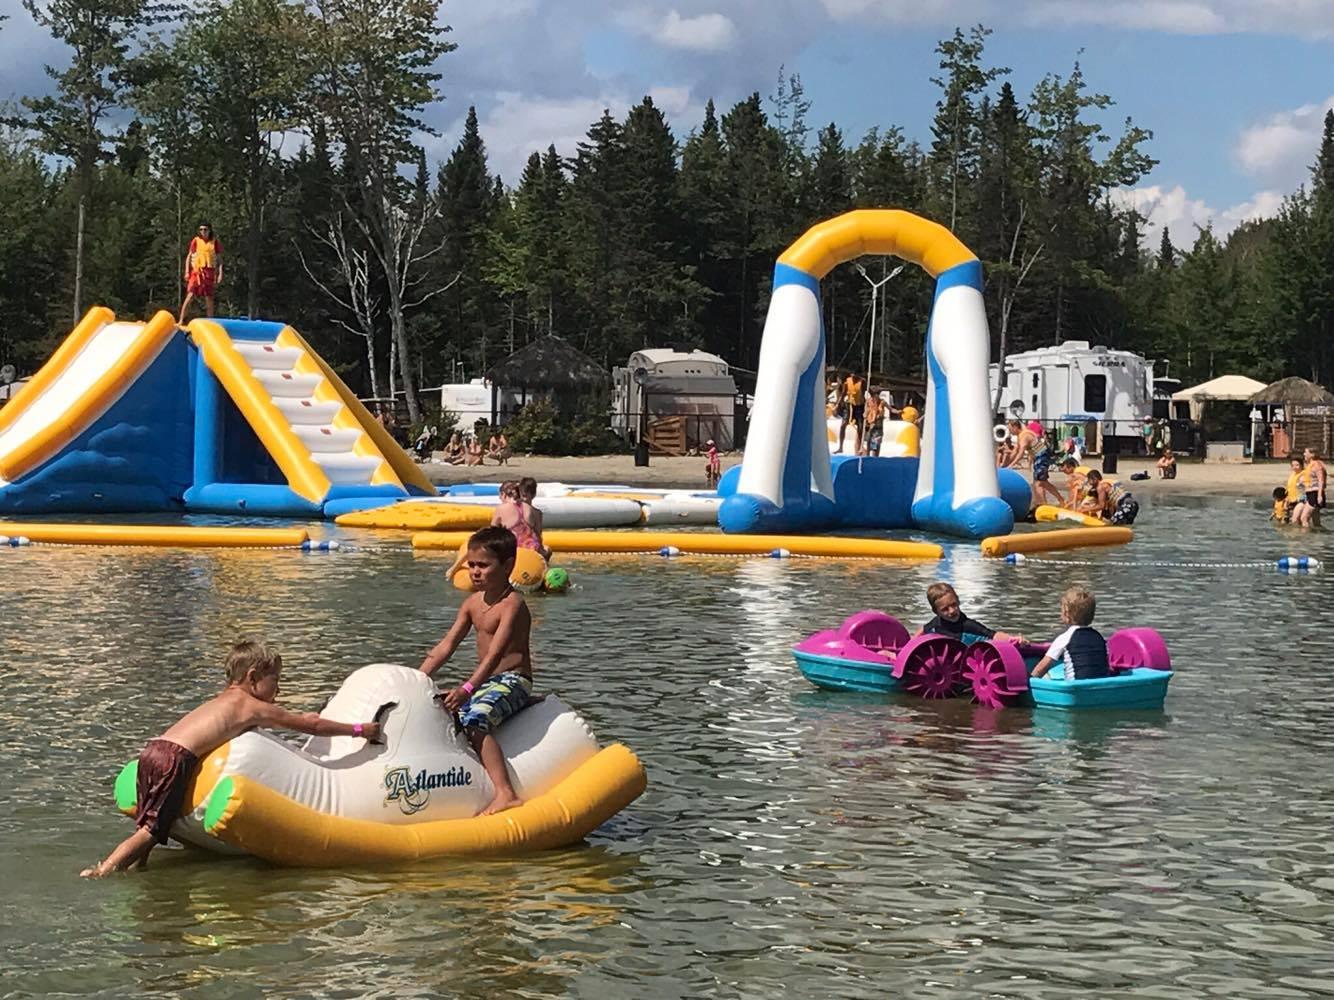 http://www.campingatlantide.com/wp-content/uploads/2018/01/beach-party-2017-complexe-atlantide-9.jpg